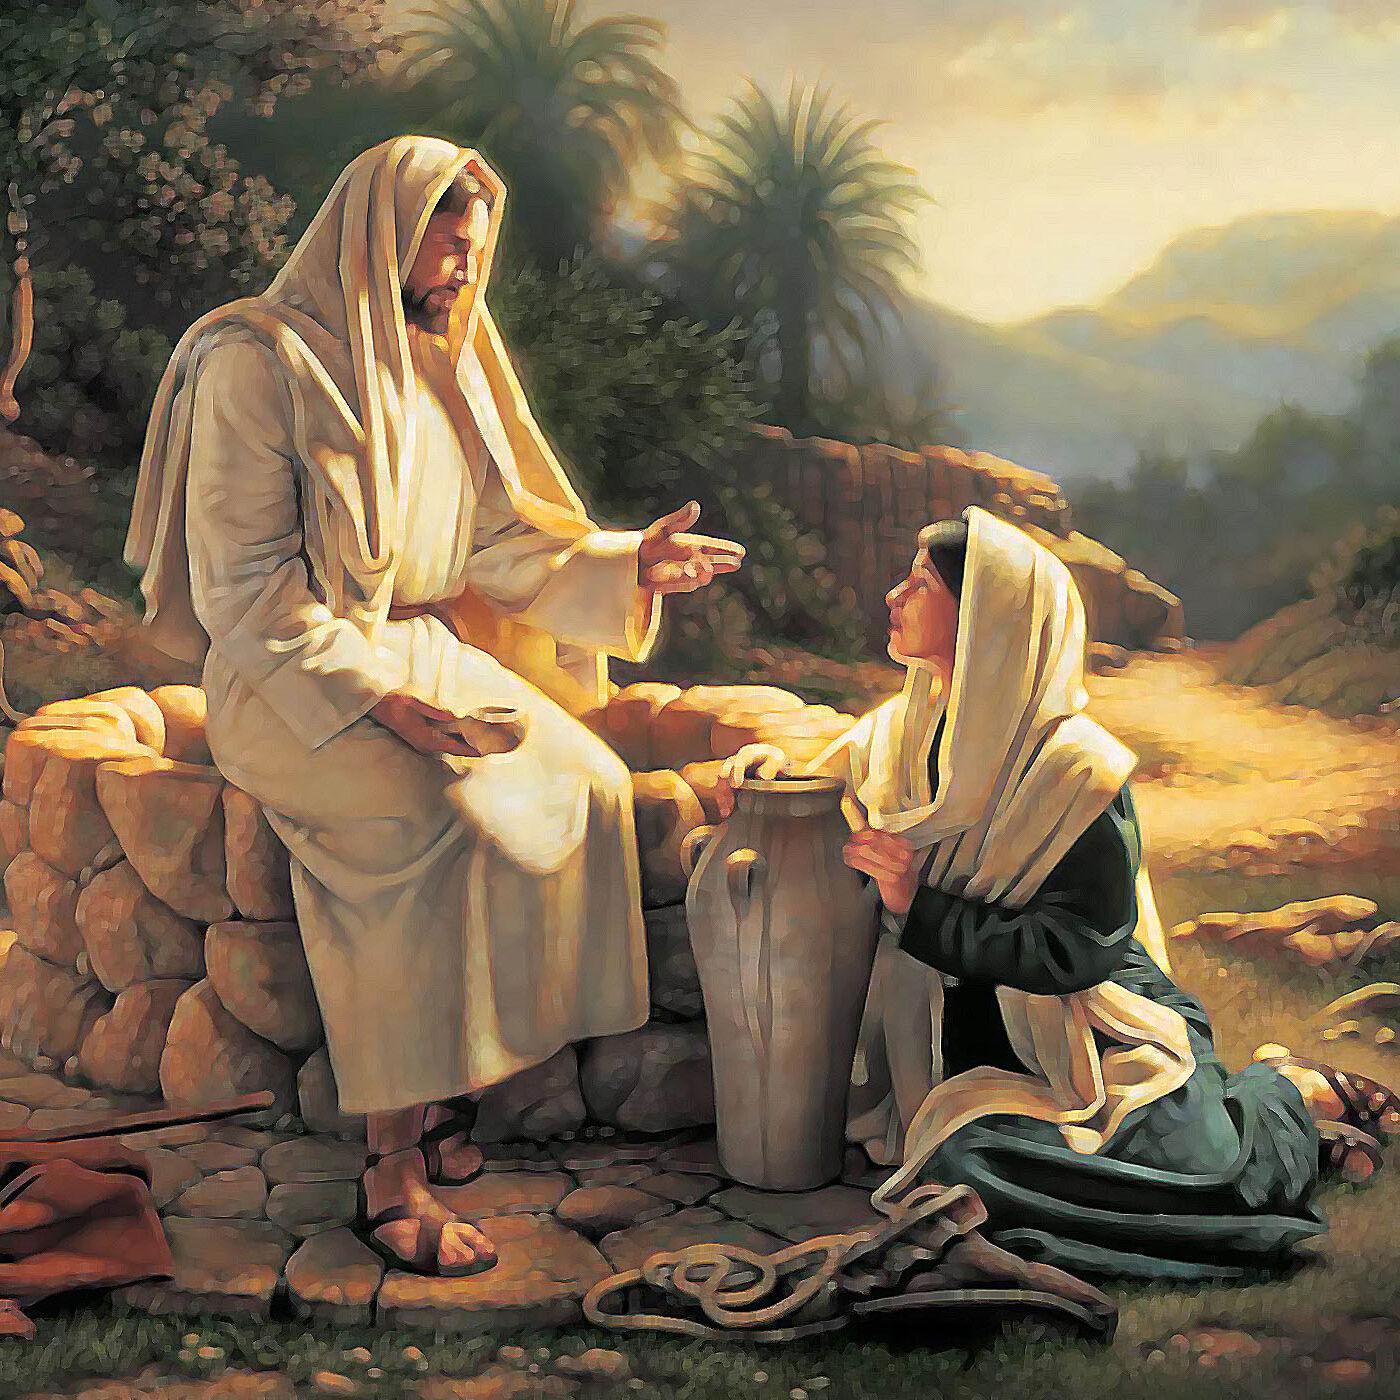 riflessioni sul Vangelo di Venerdì 9 Ottobre 2020 (Lc 11, 15-26)